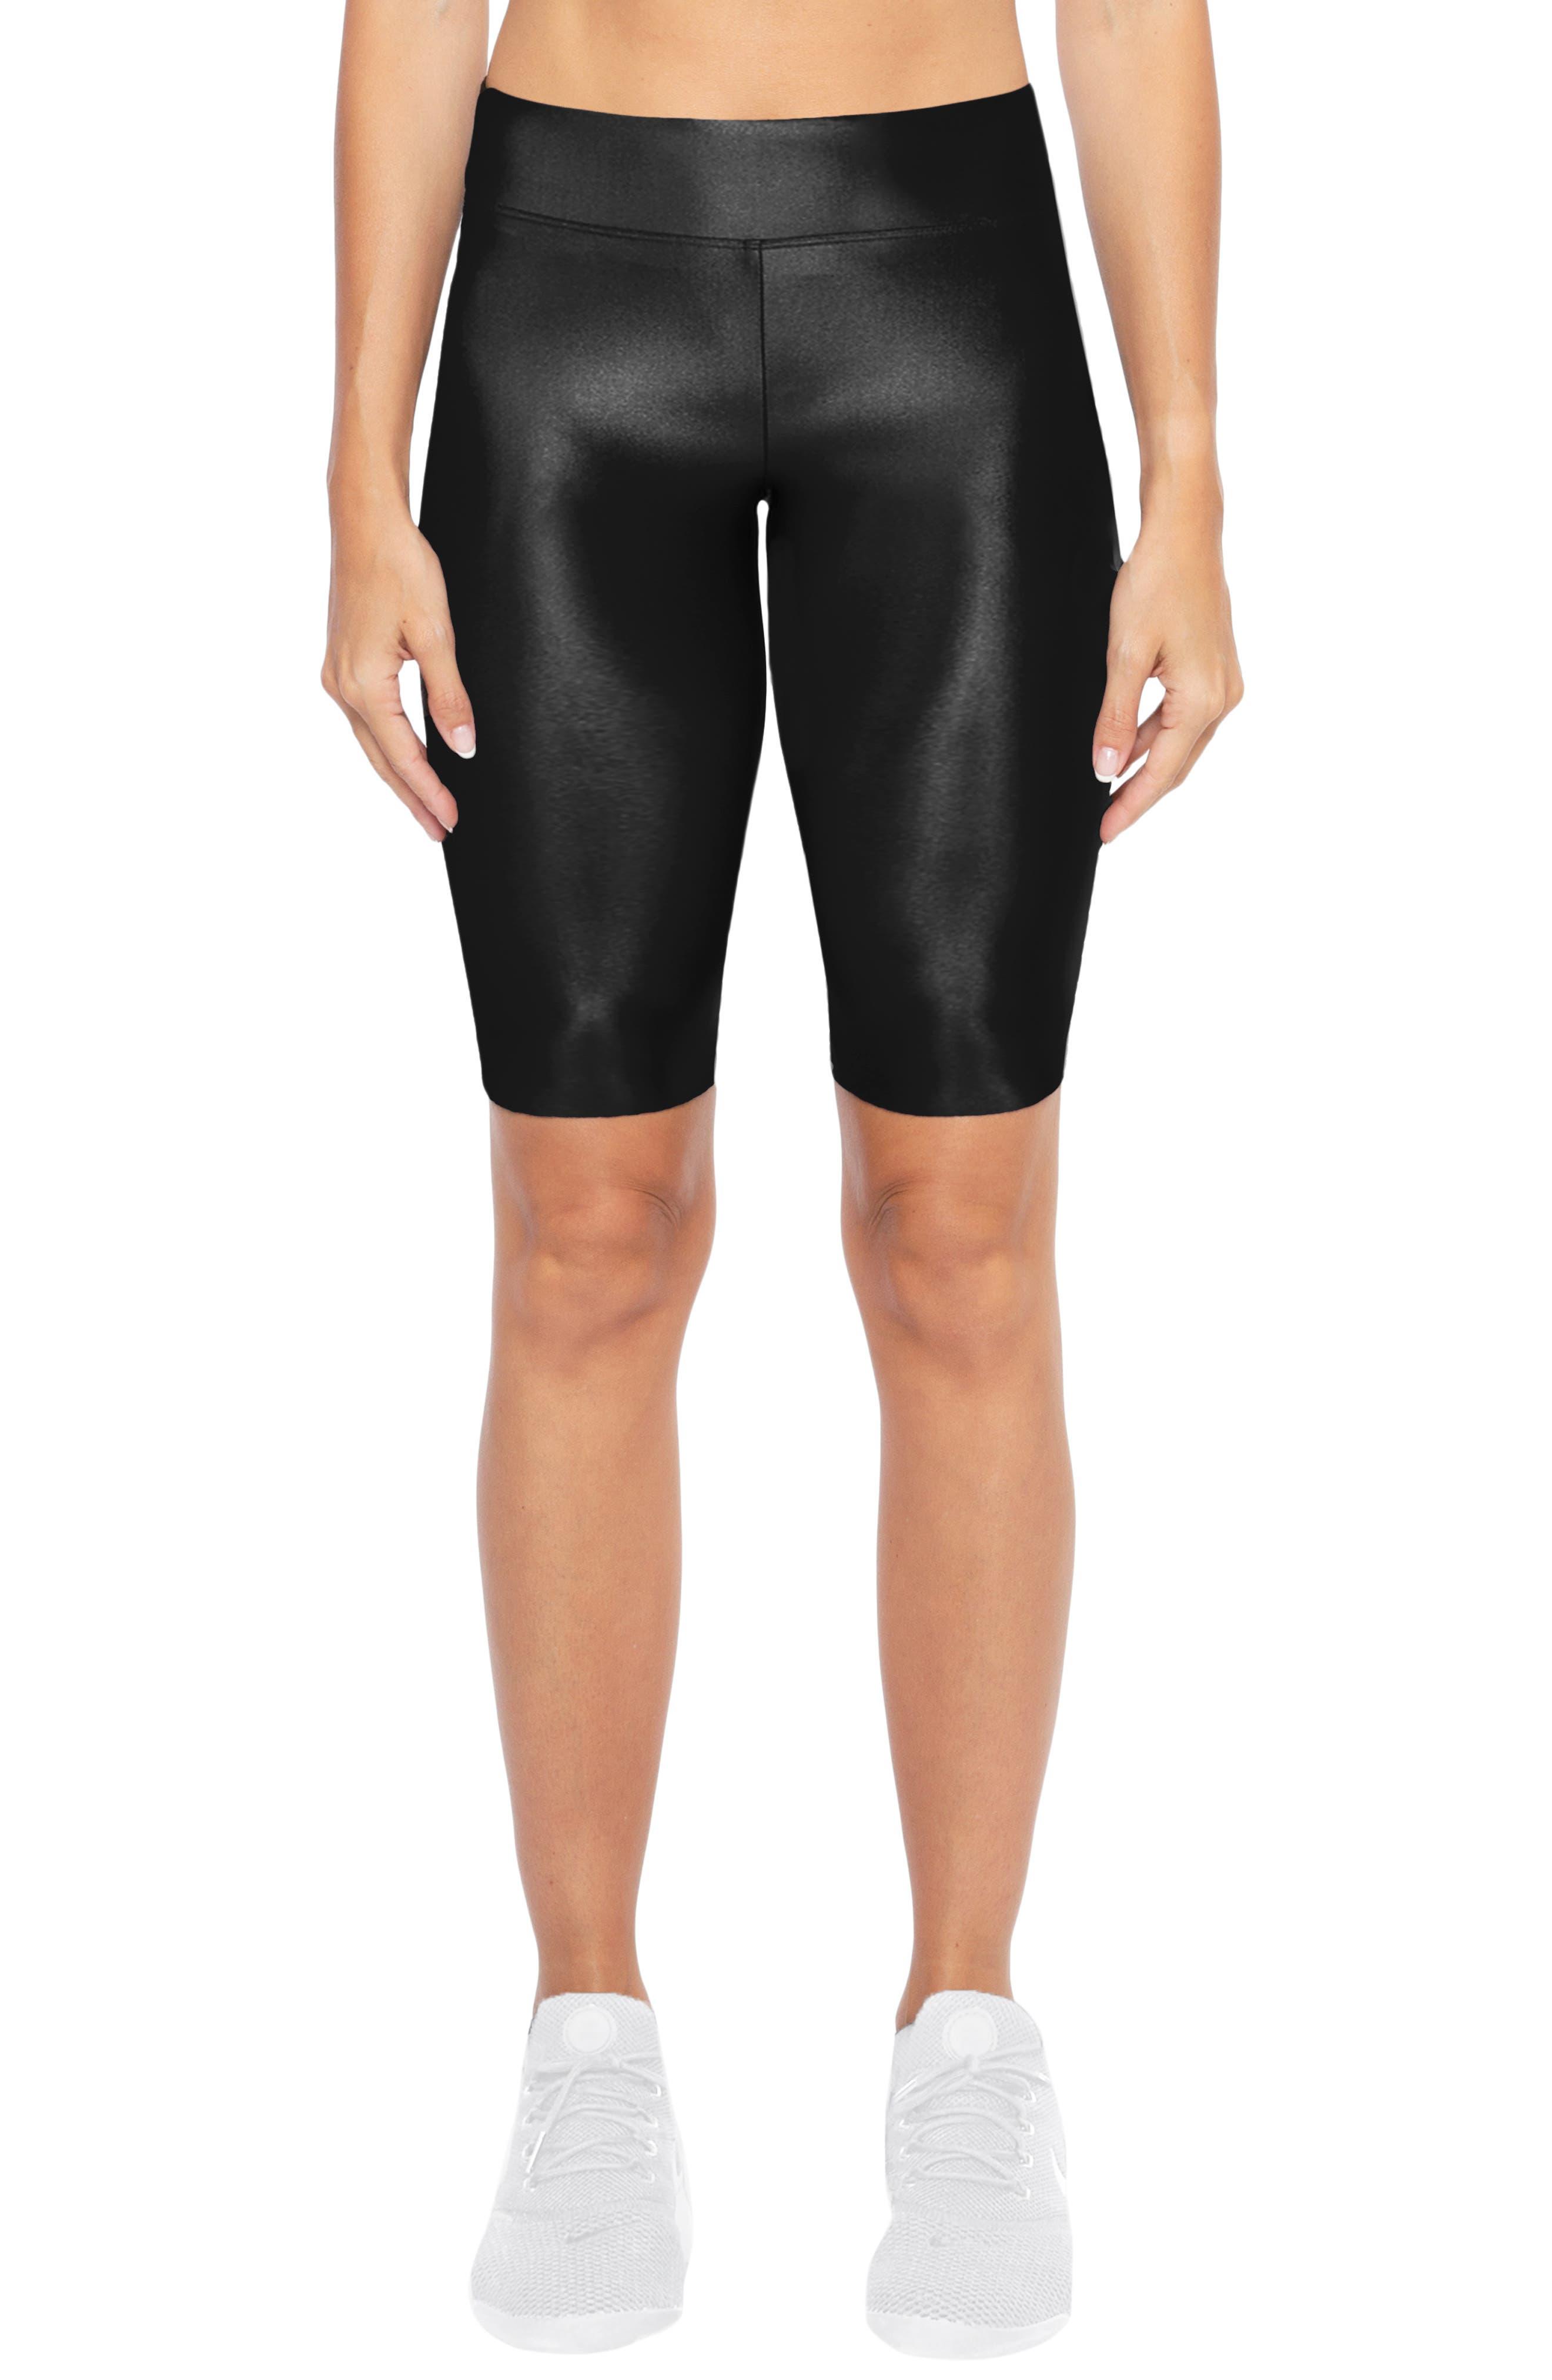 Densonic High Waist Bike Shorts,                             Main thumbnail 1, color,                             BLACK